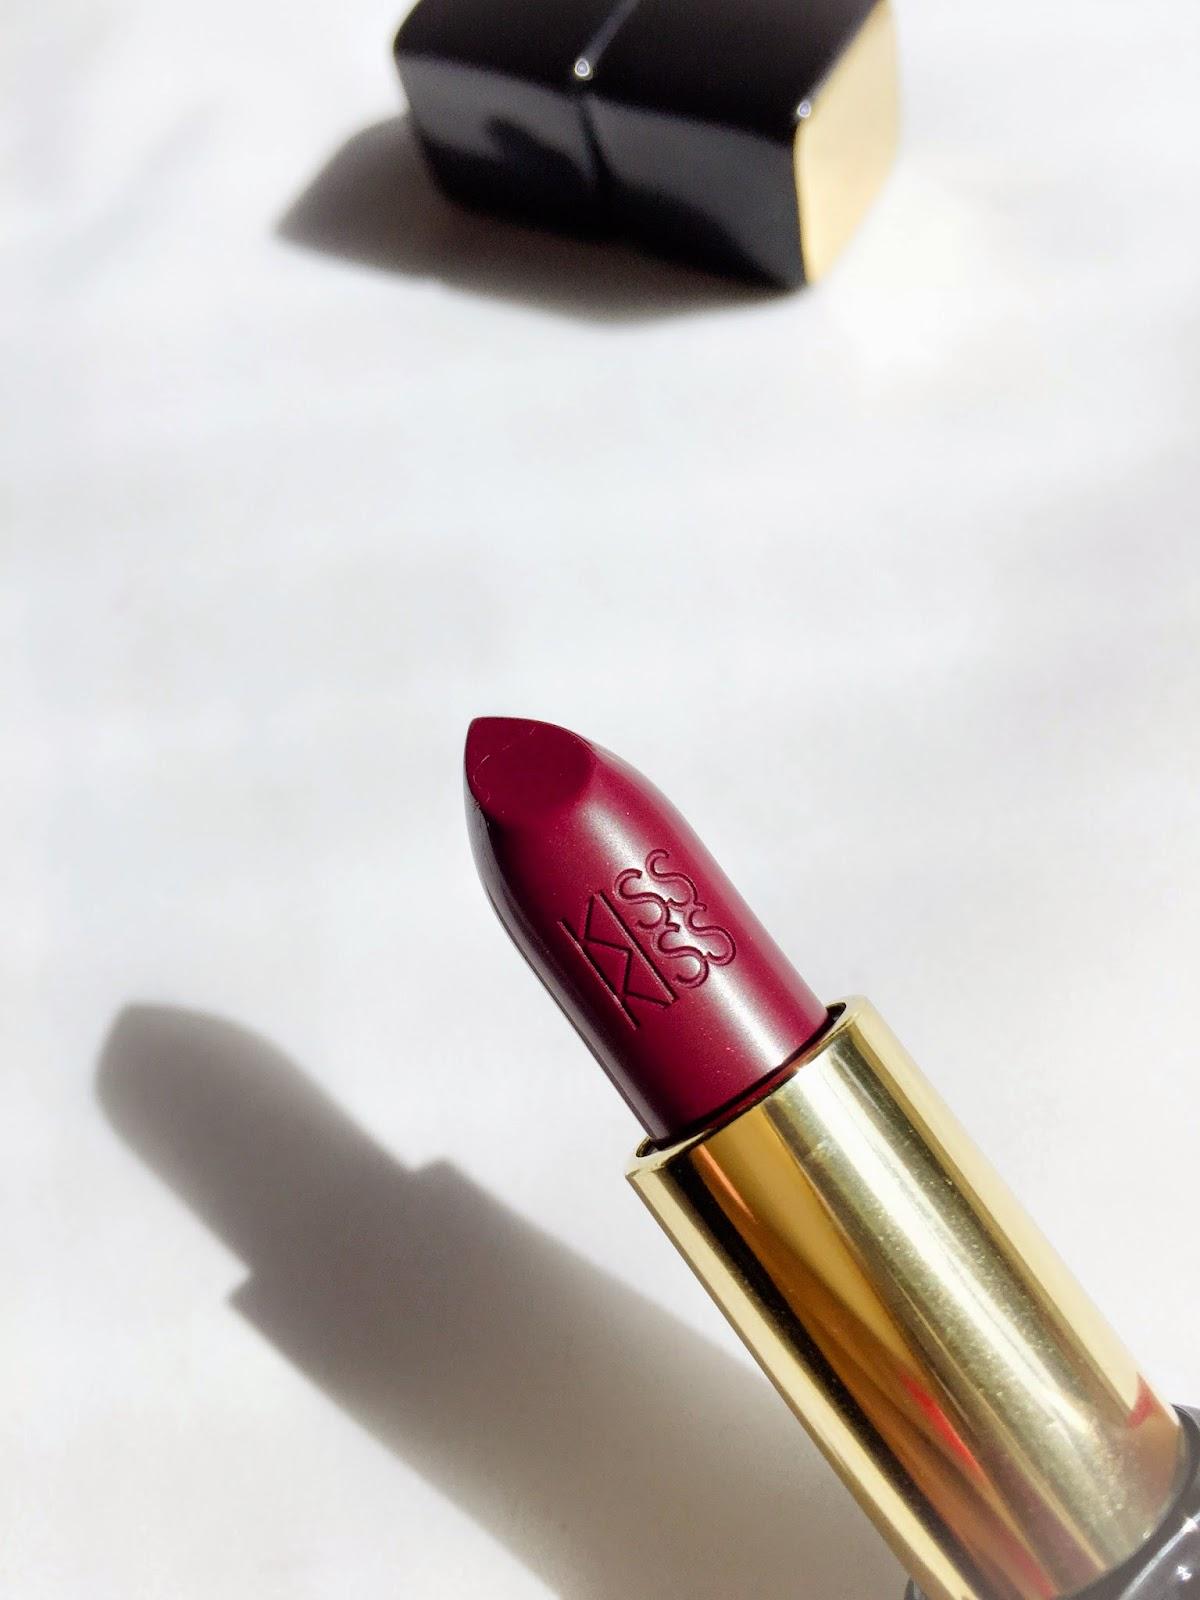 Guerlain Kiss Kiss Lipstick in So Plum